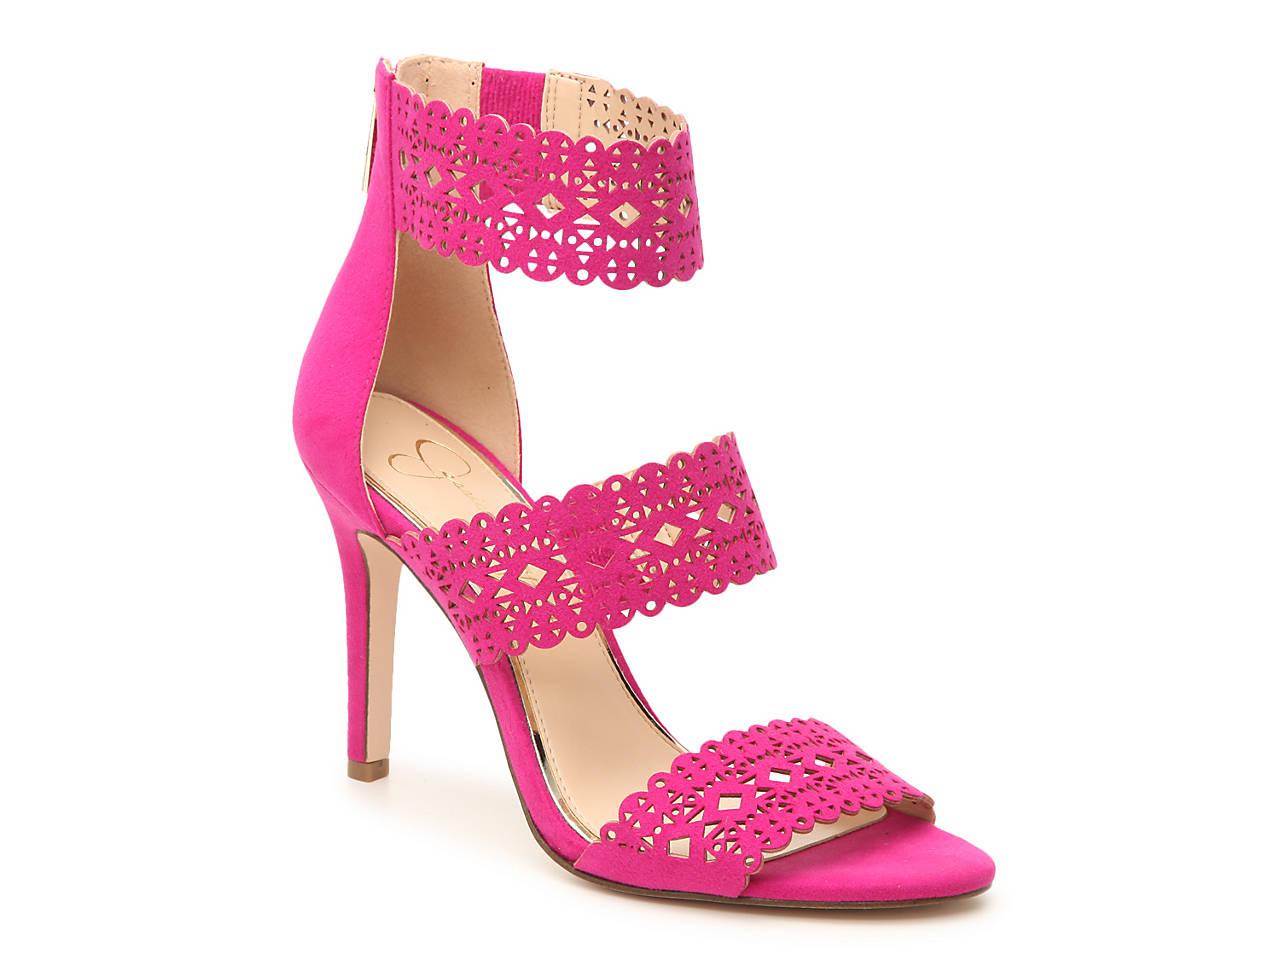 518b74e40951 Jessica Simpson Jillesa 3 Sandal Women s Shoes